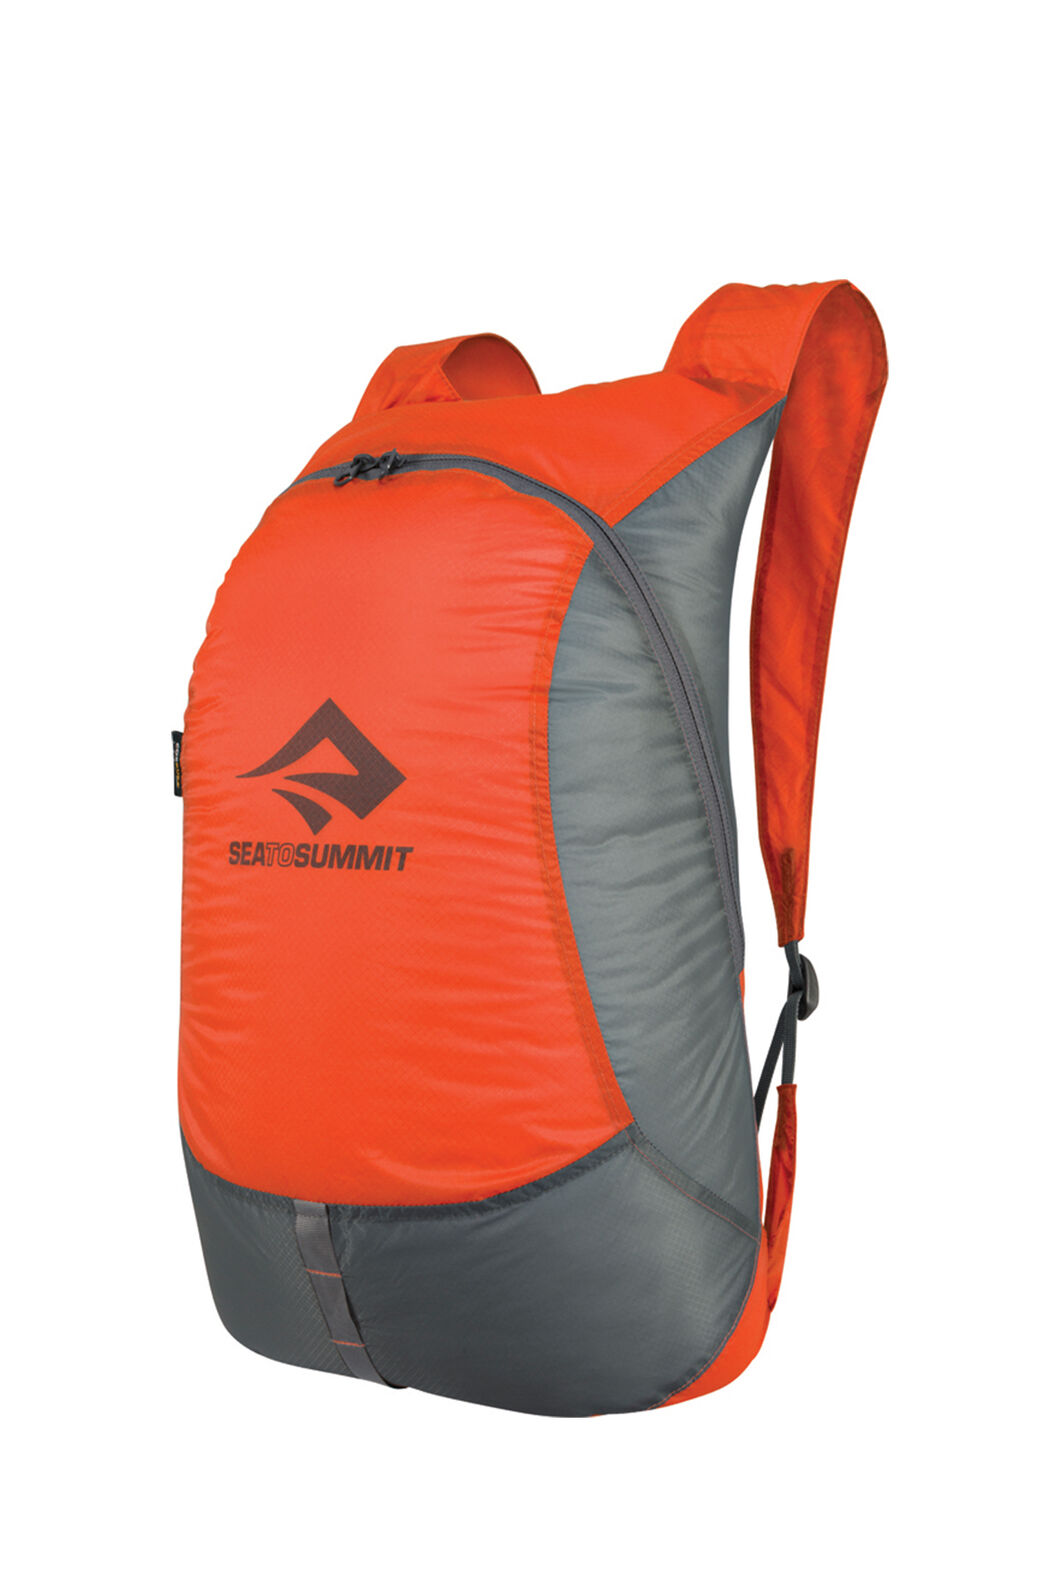 Sea to Summit Ultra-Sil Daypack 20L, Orange, hi-res